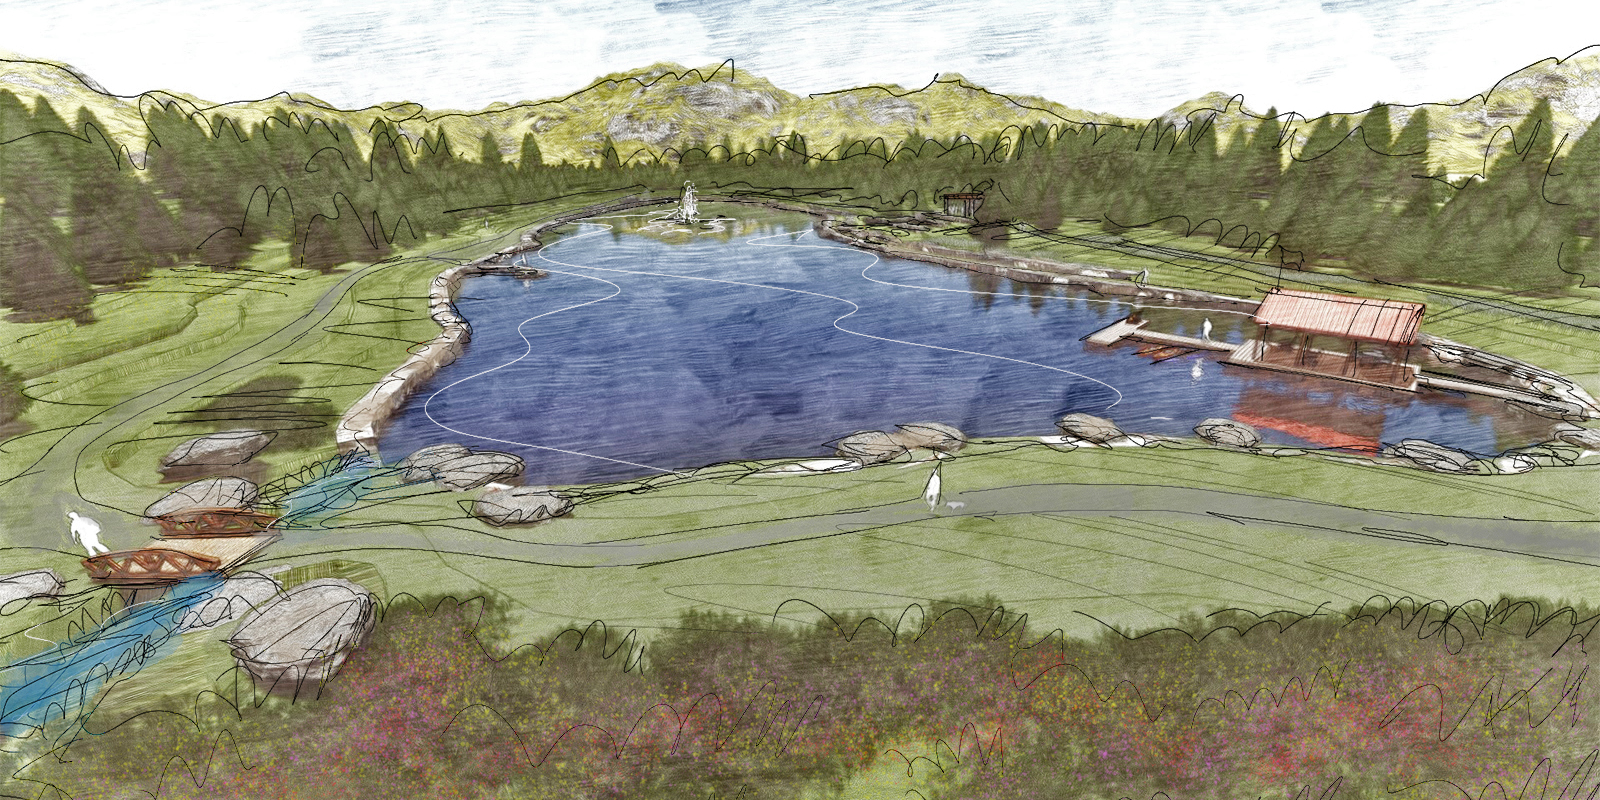 ELK PARK RANCH - Lake park, boathouse & hiking trails